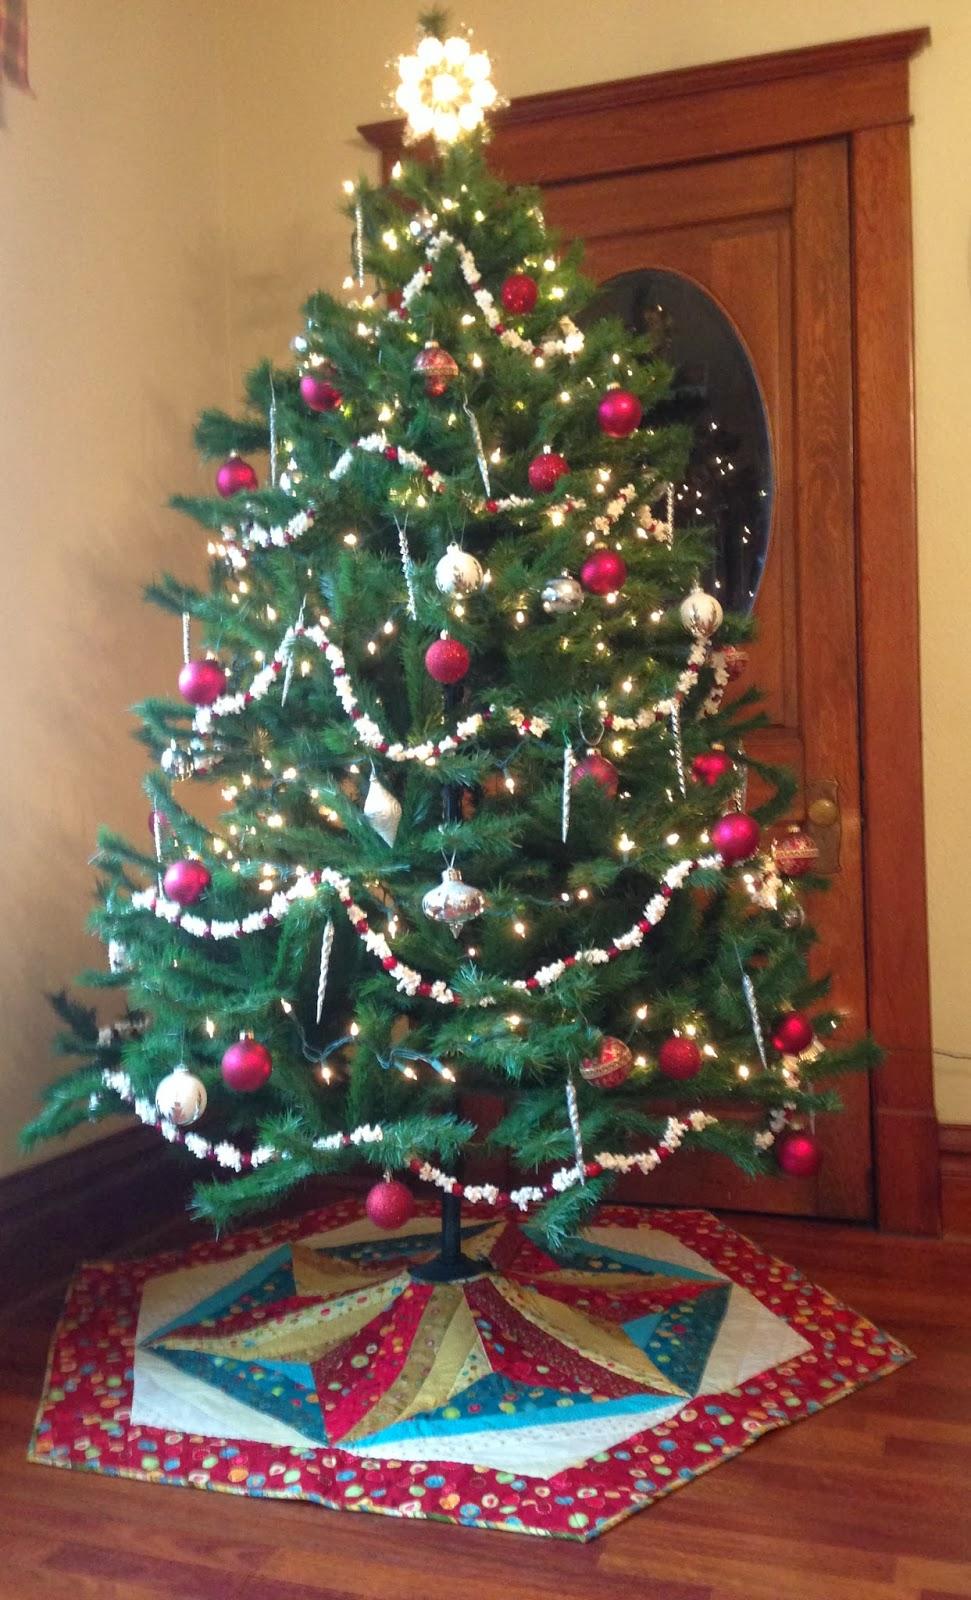 12 Days Of Christmas Tree Skirt